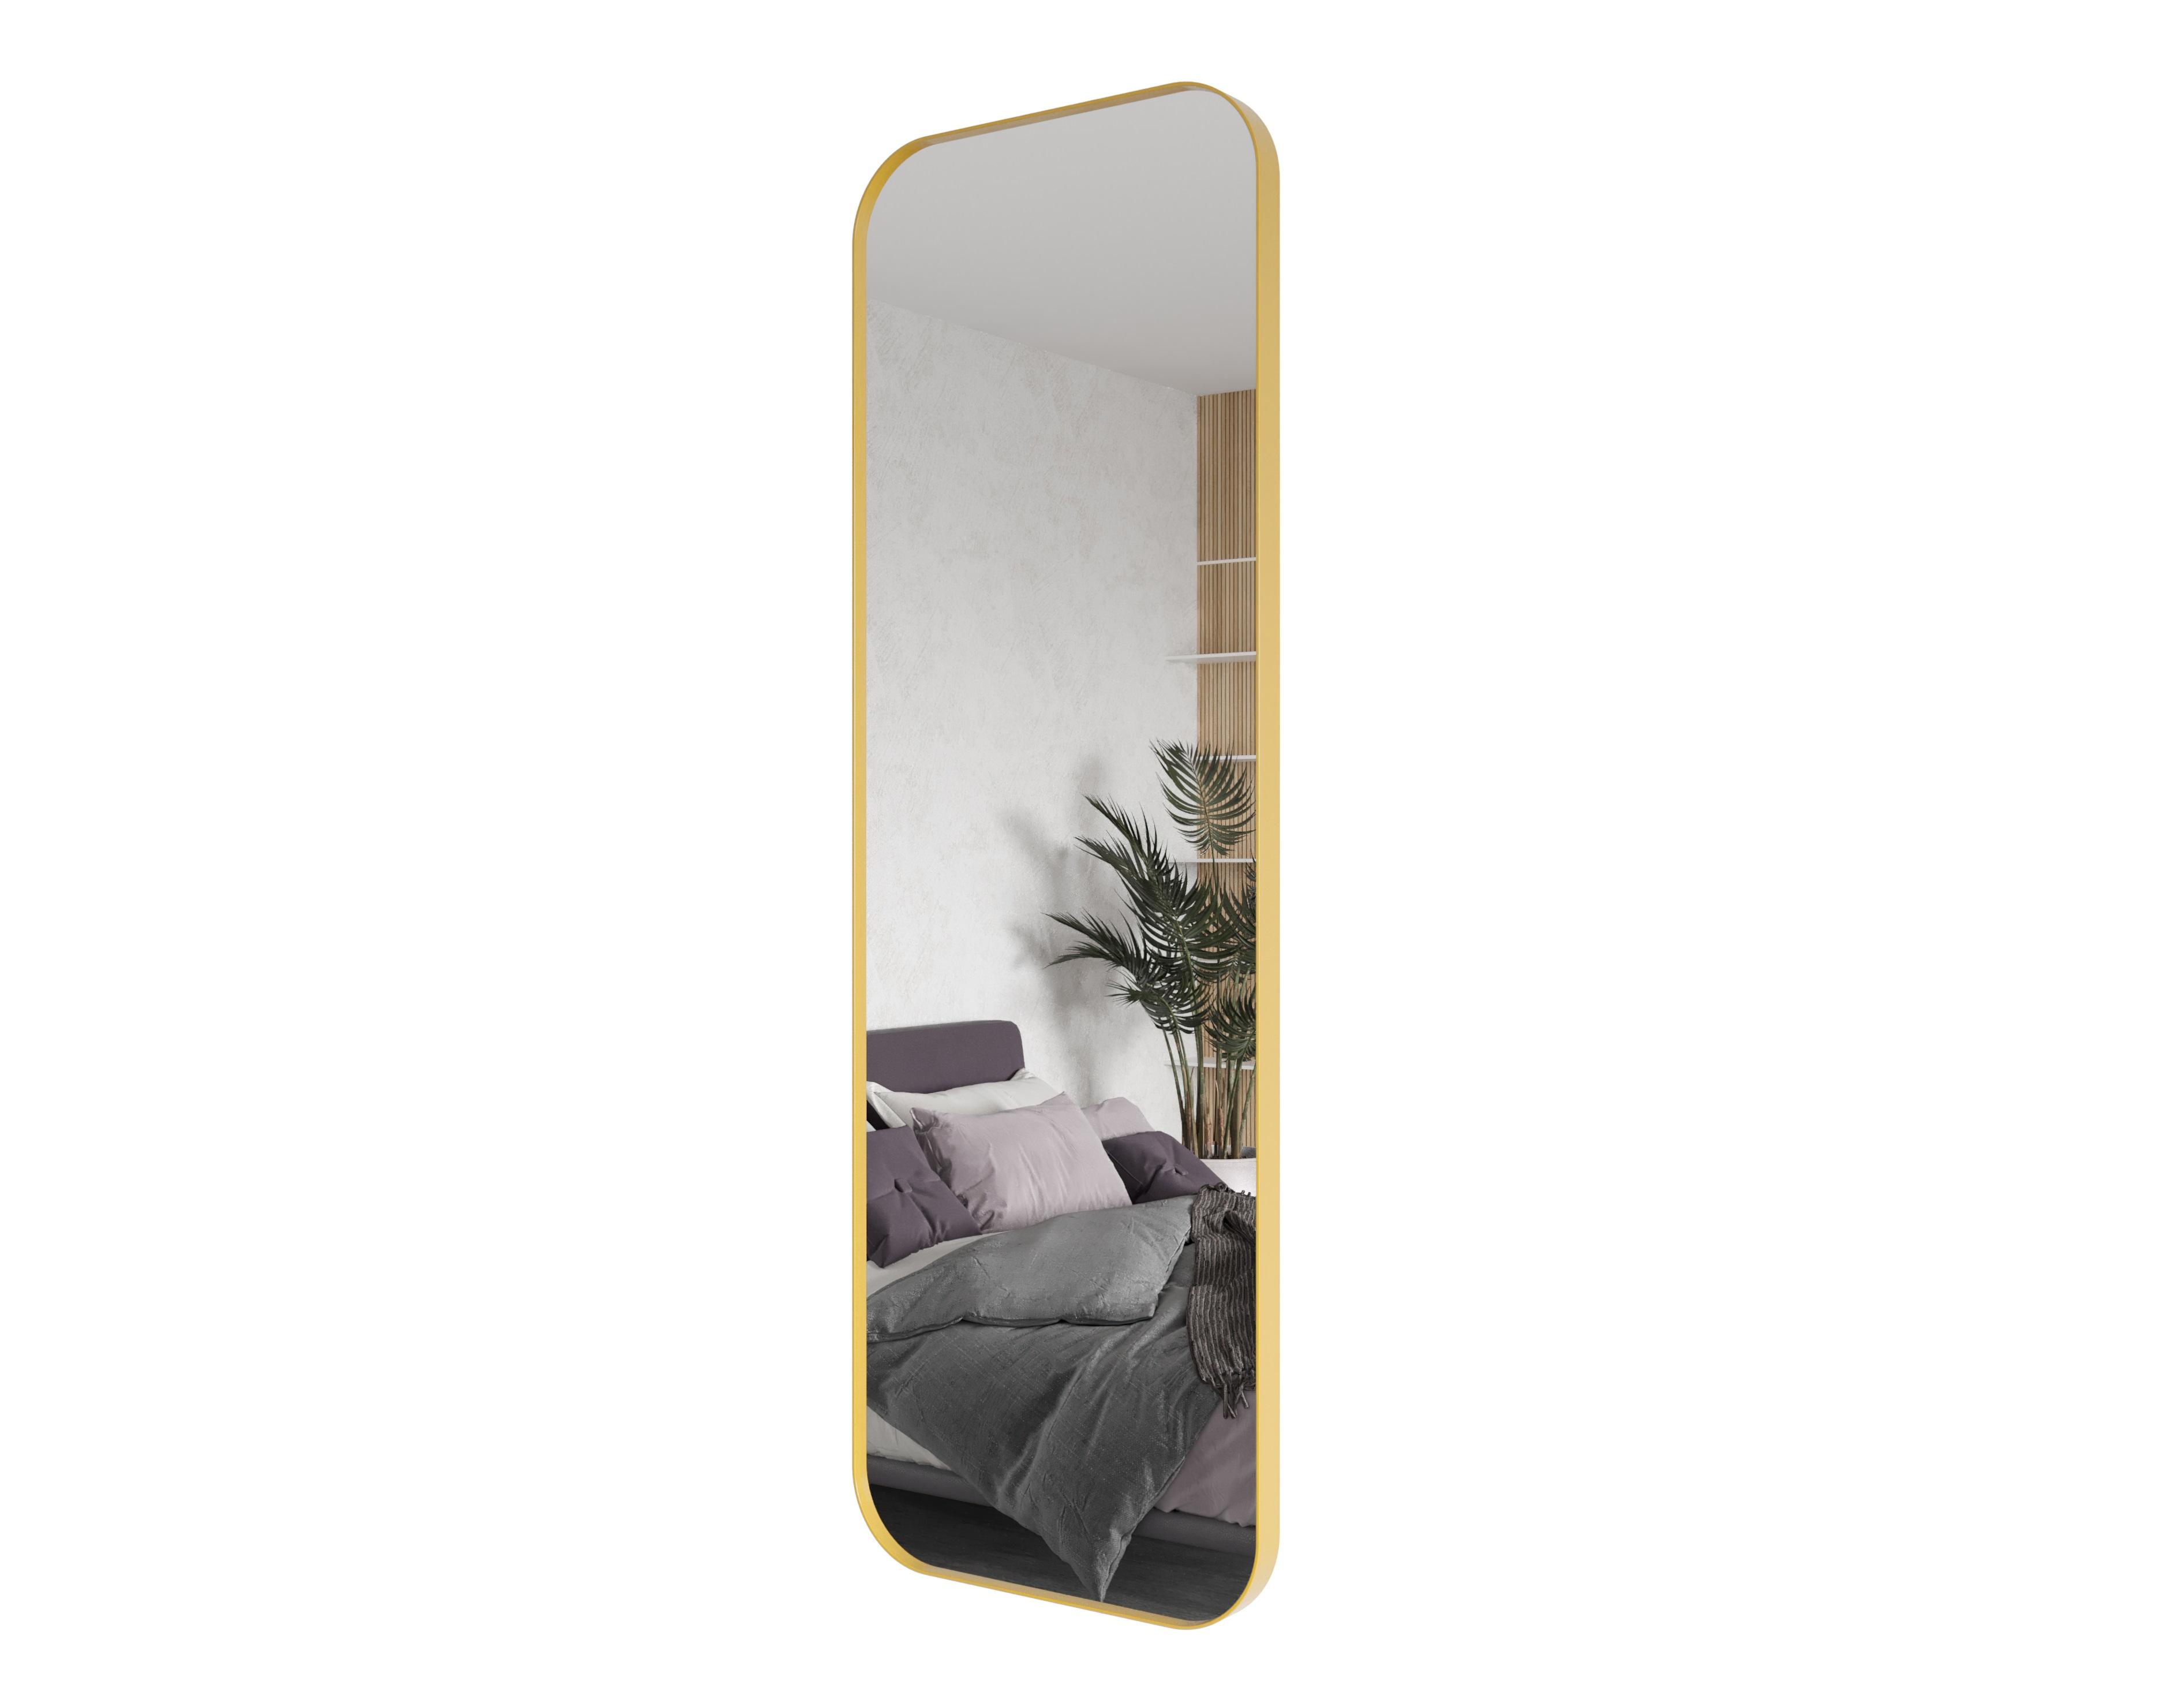 Зеркало kuvino (genglass) золотой 50x150x5 см.